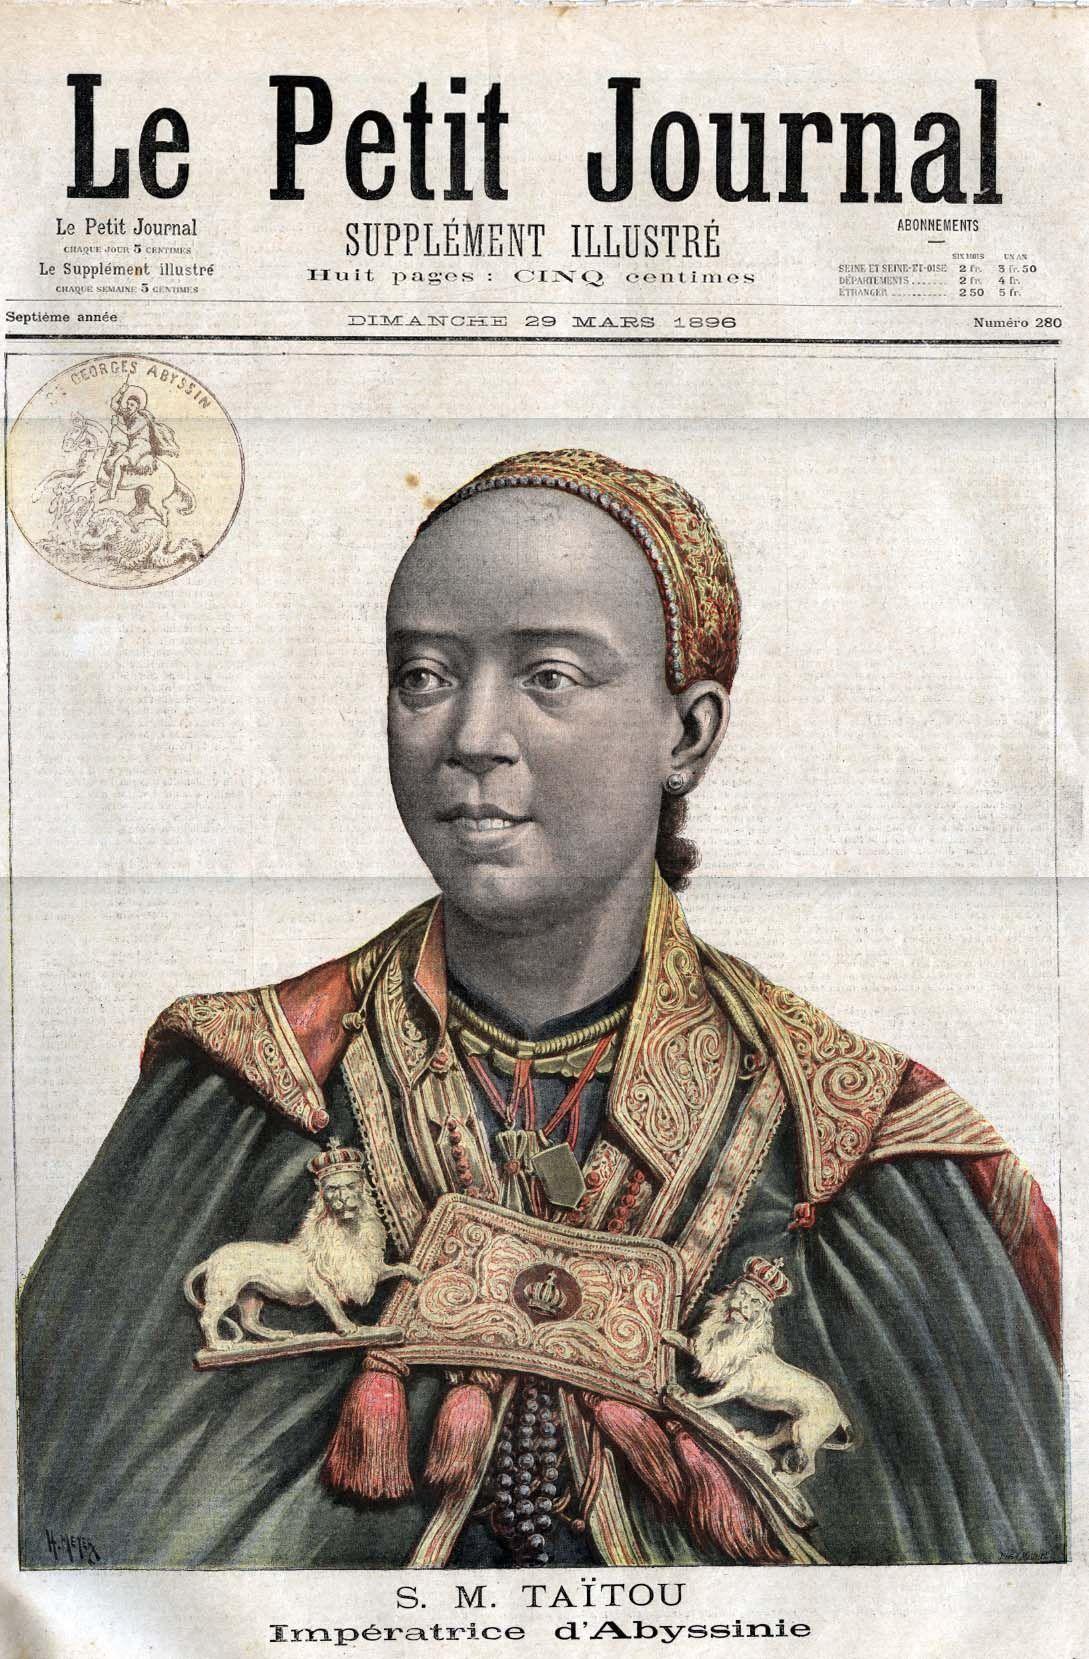 Empress Taytu, the wife of Ethiopian Emperor Menelik